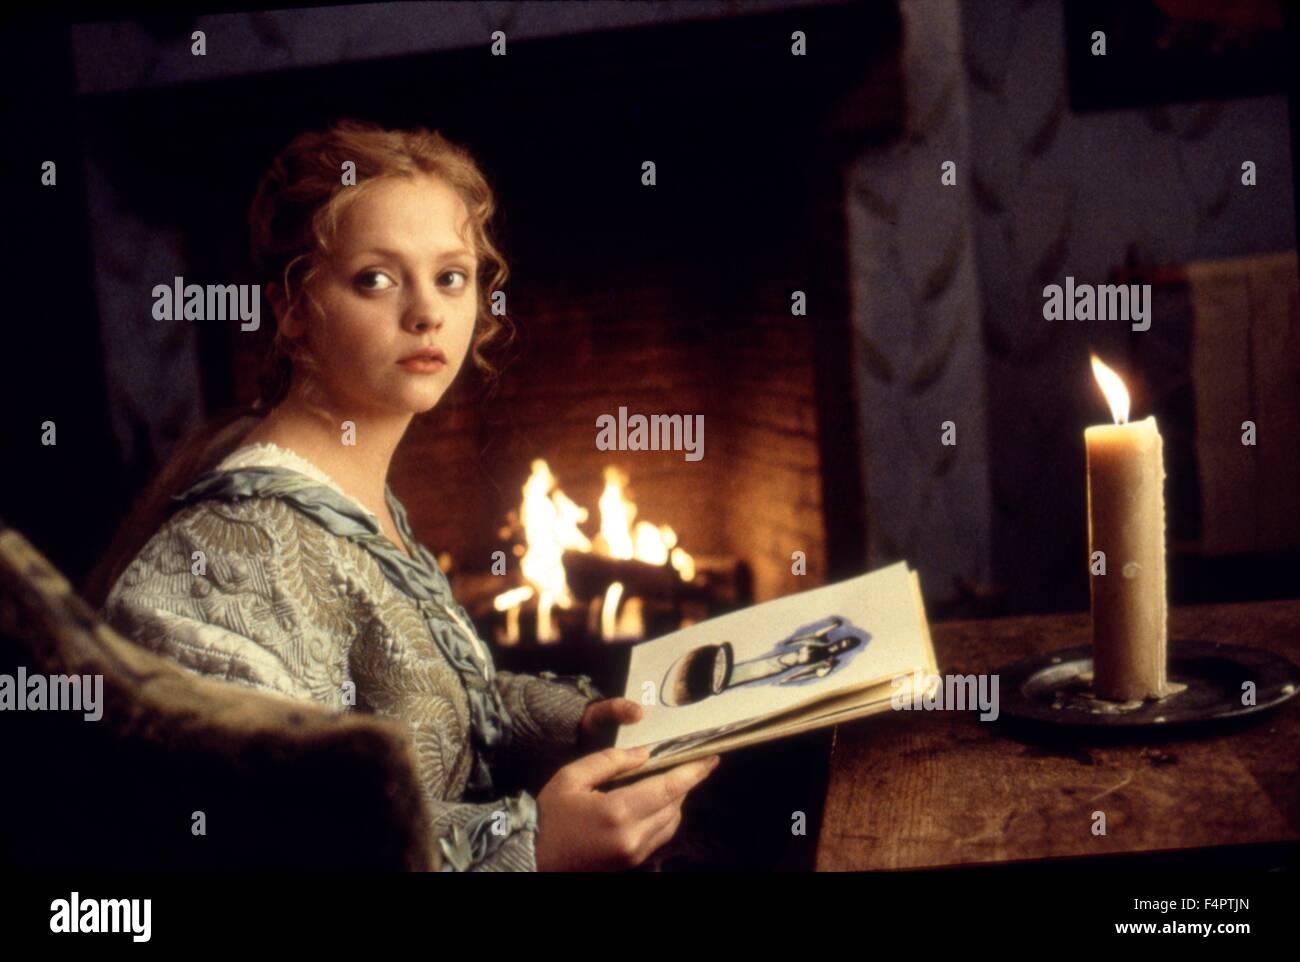 Christina Ricci / Sleepy Hollow / 1999 directed by Tim Burton [Paramount Pictures] - Stock Image